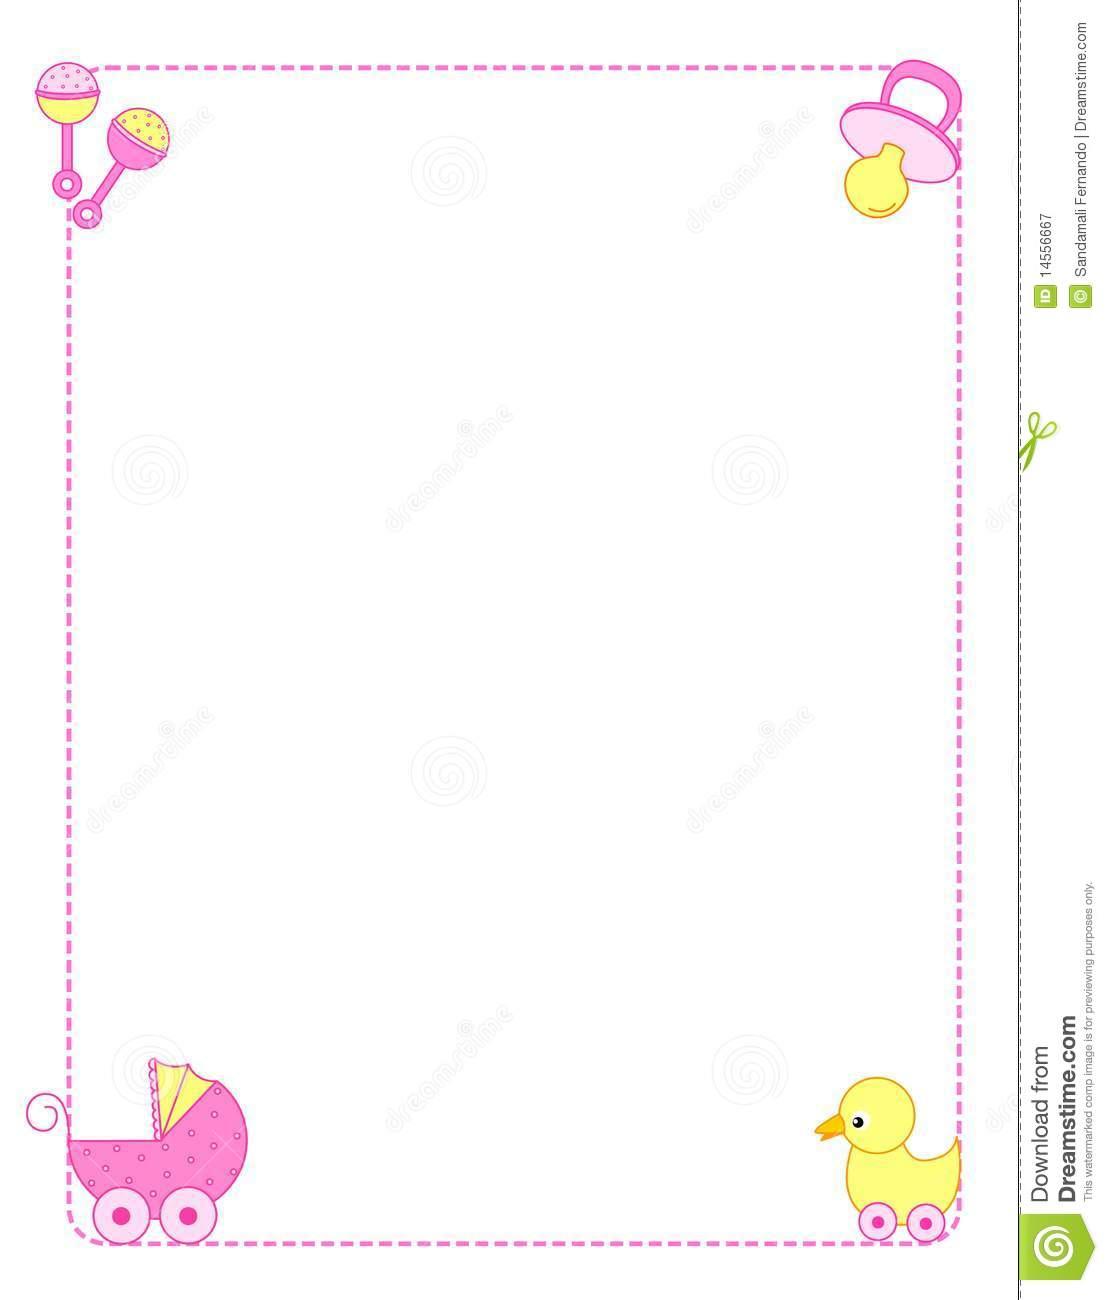 Child clipart boarder Clipart  shower art Baby